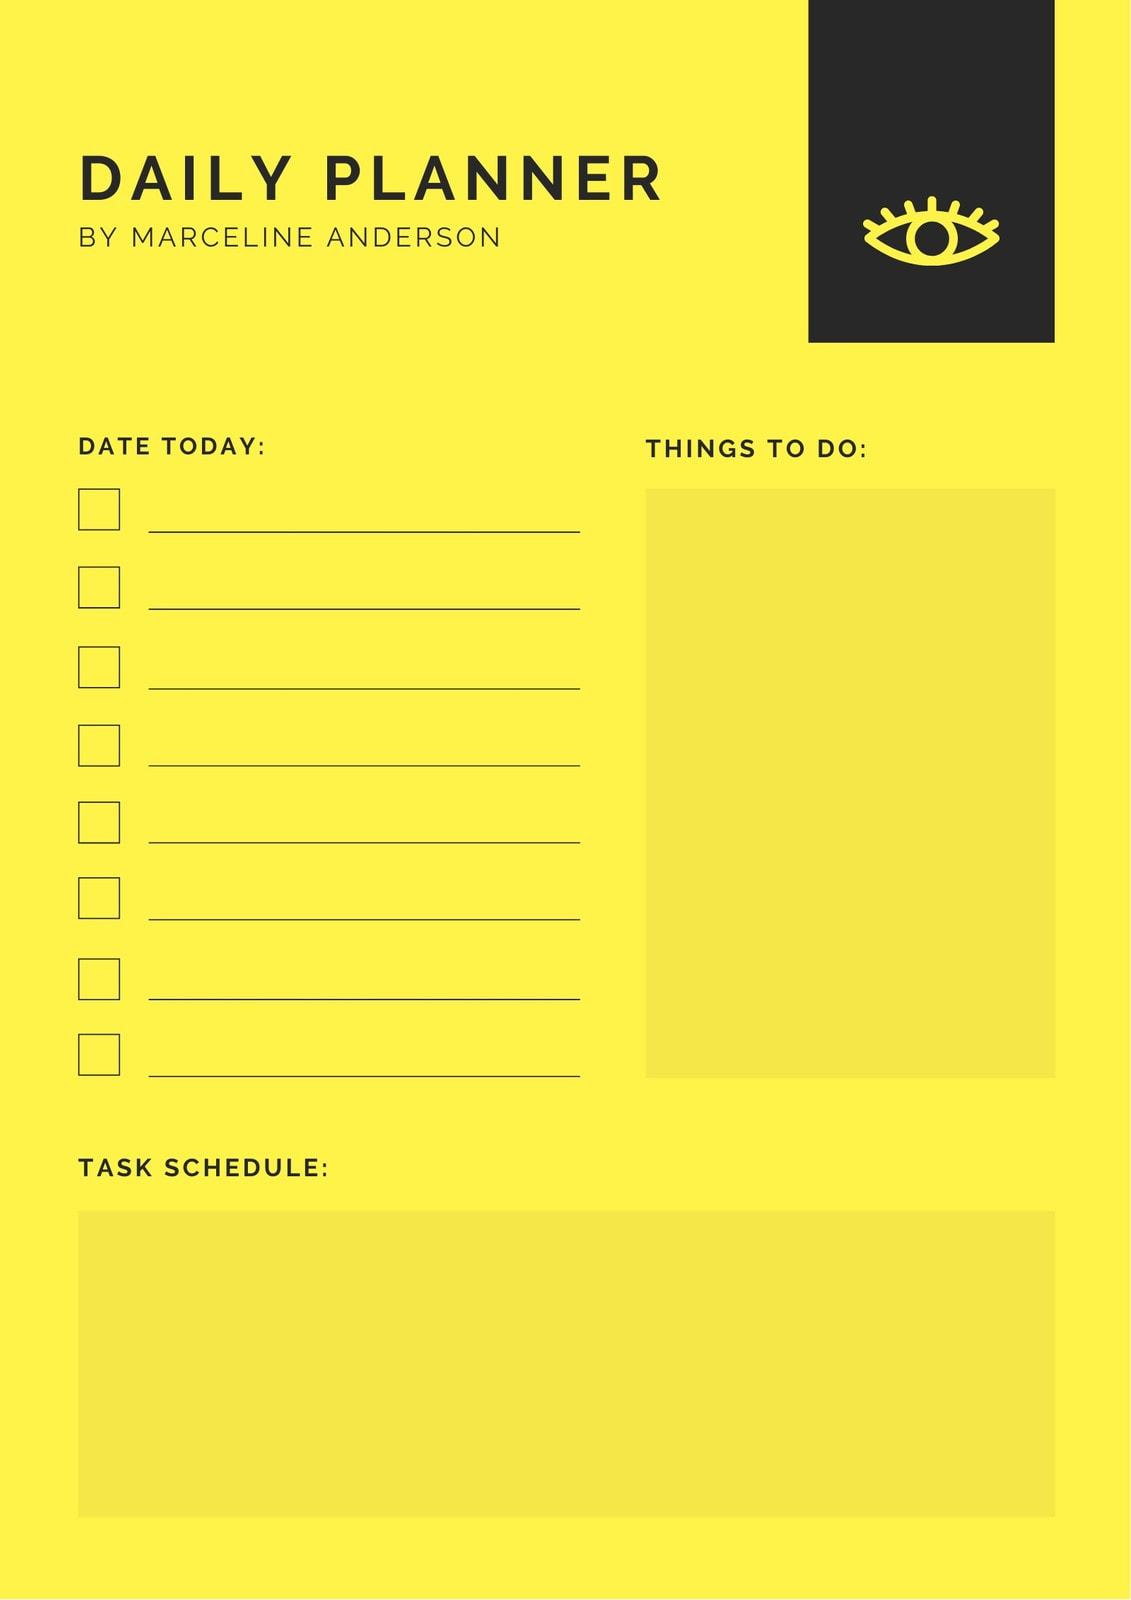 Yellow Minimalist Daily Planner